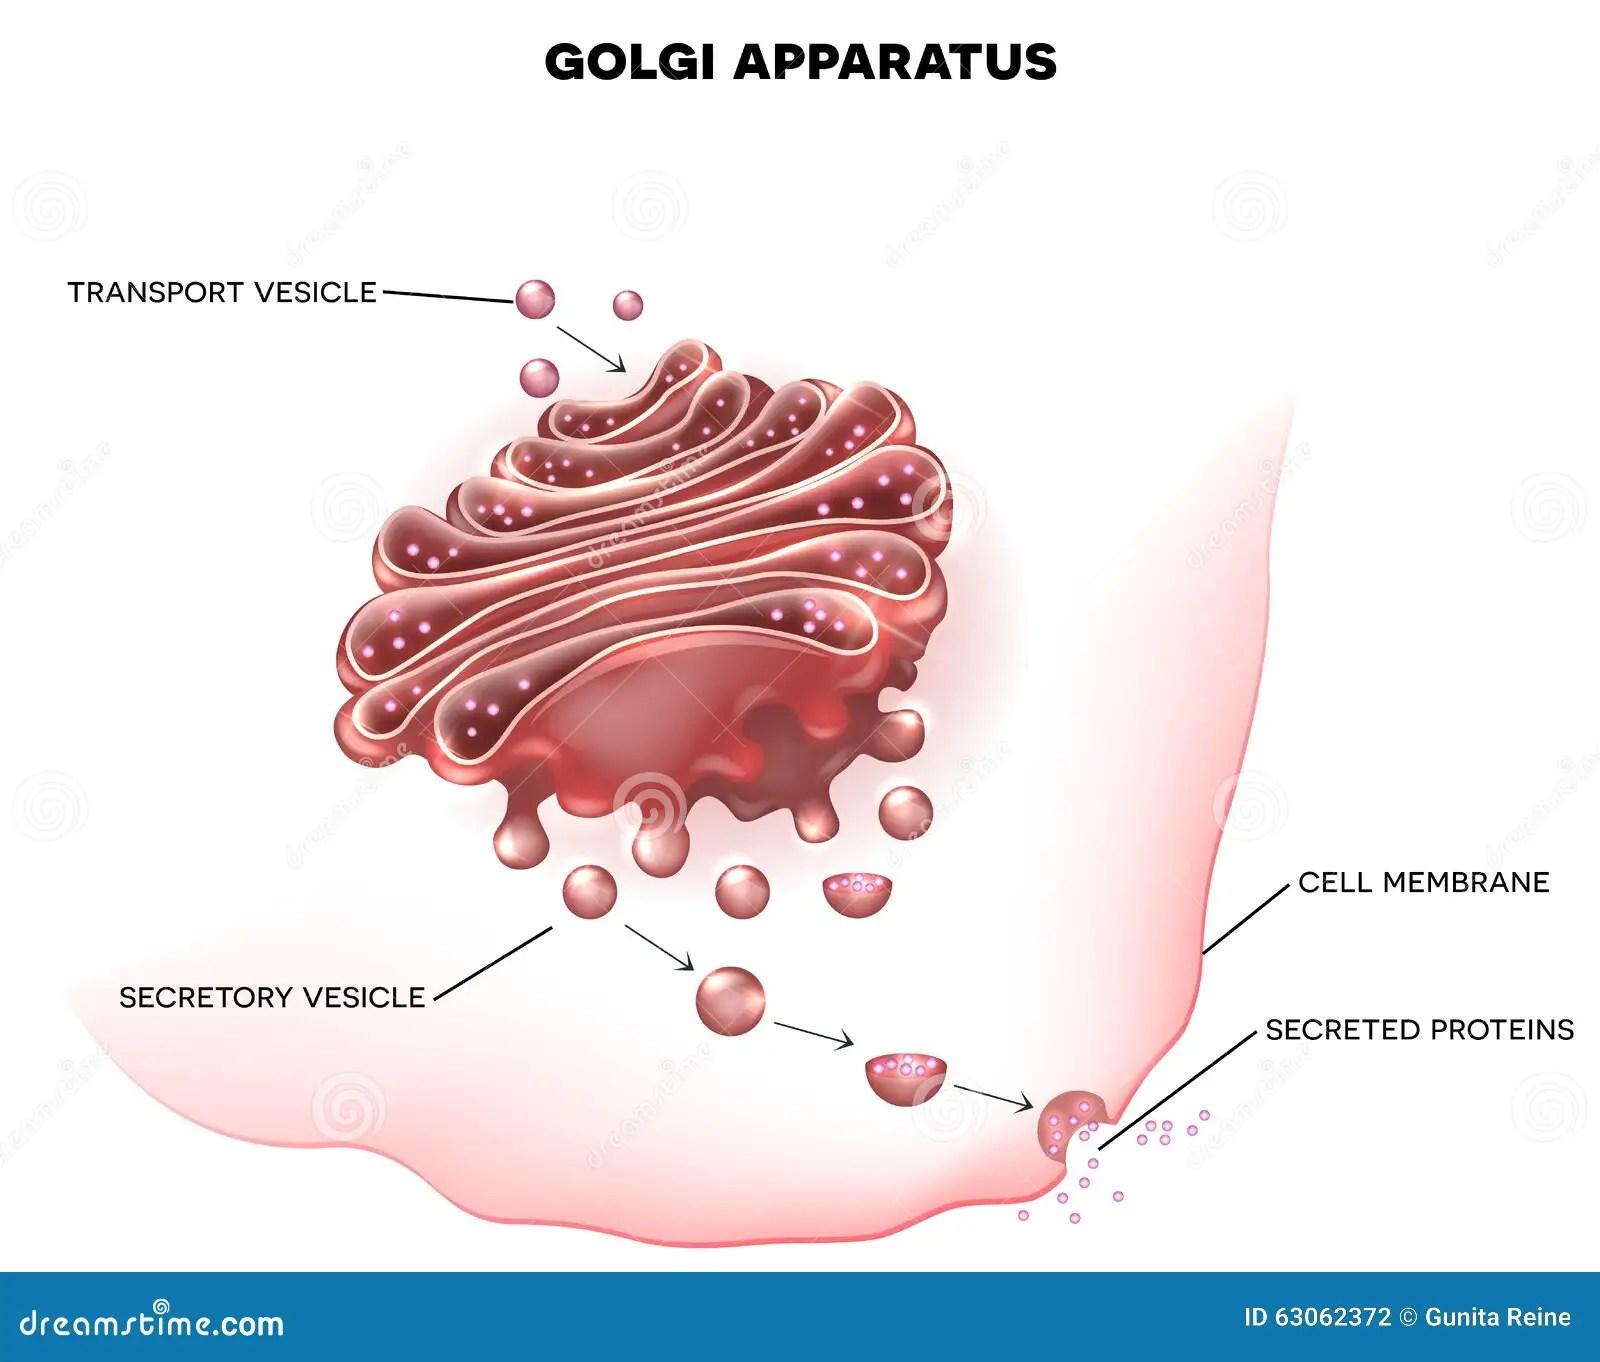 golgi apparatus structure diagram freak the mighty plot labeled